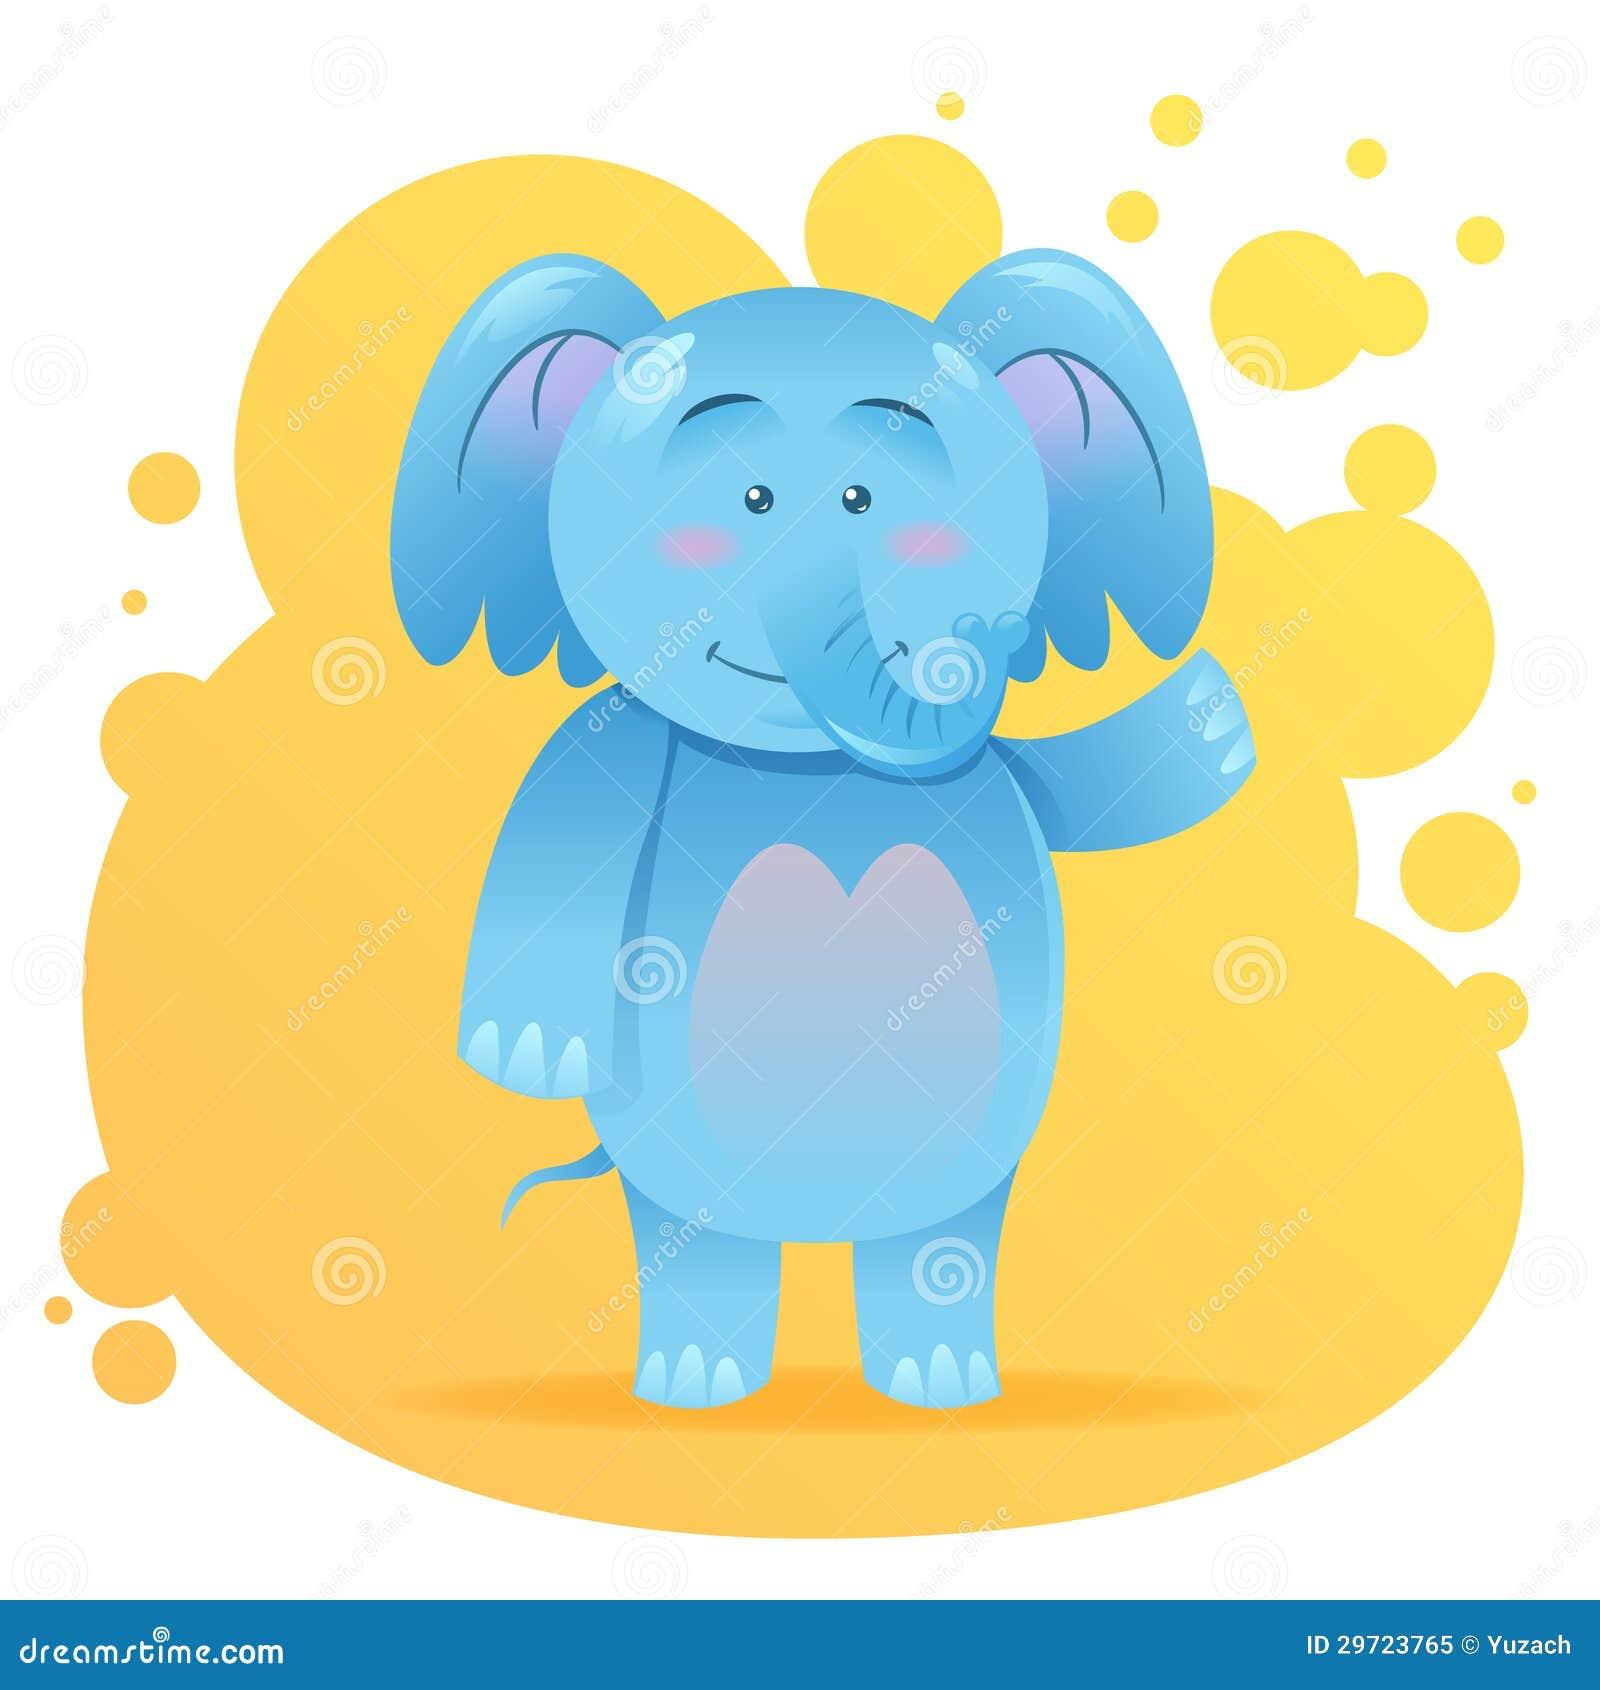 Cute Cartoon Elephant Toy Stock Illustrations – 2,519 Cute ...